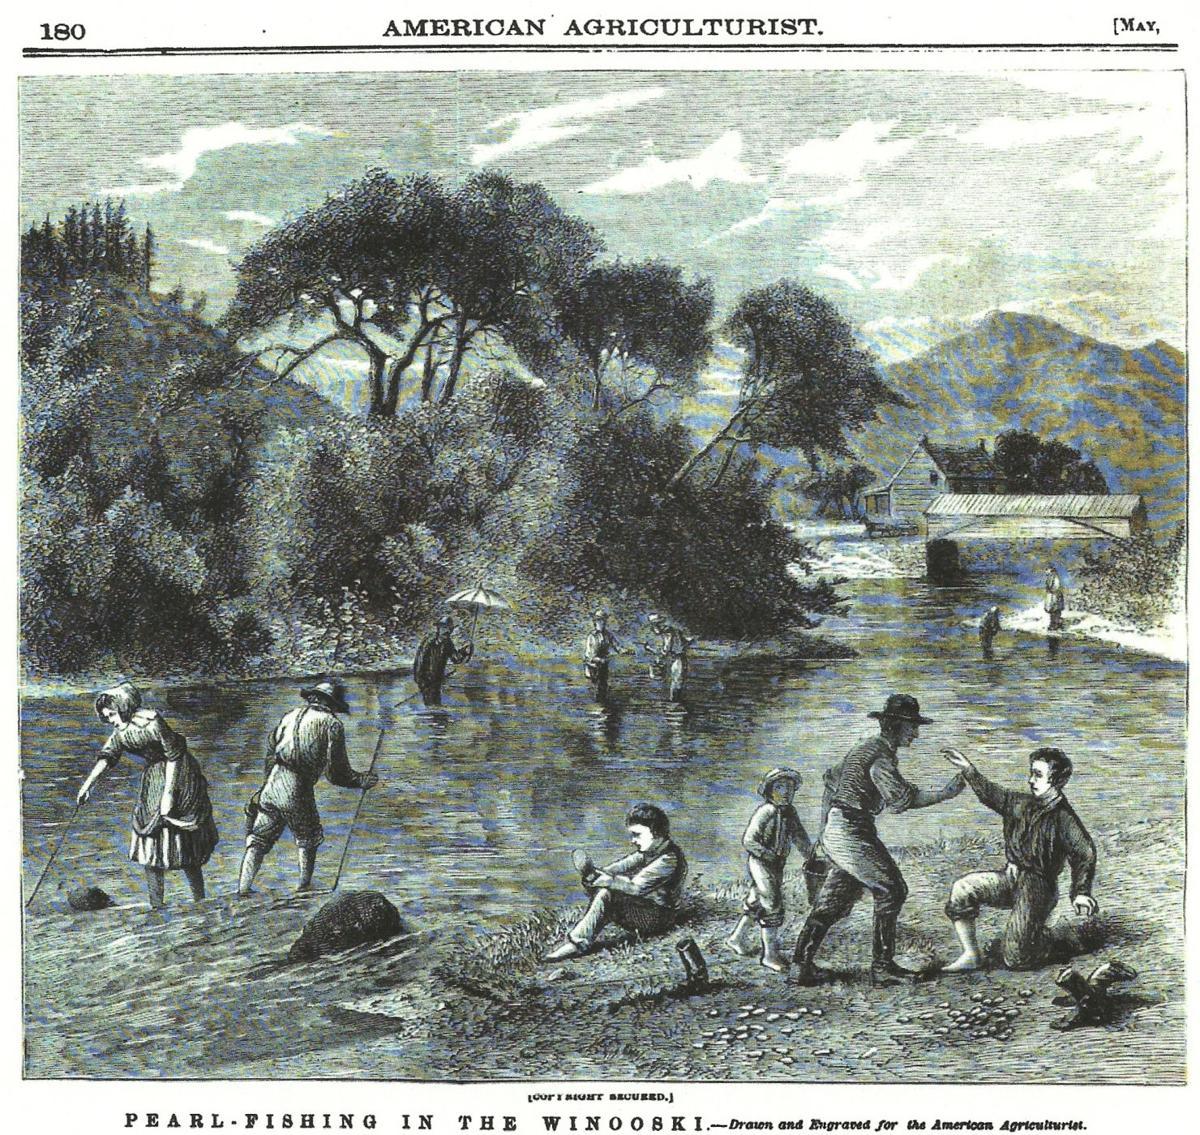 Heller: The Winooski River freshwater pearl rush